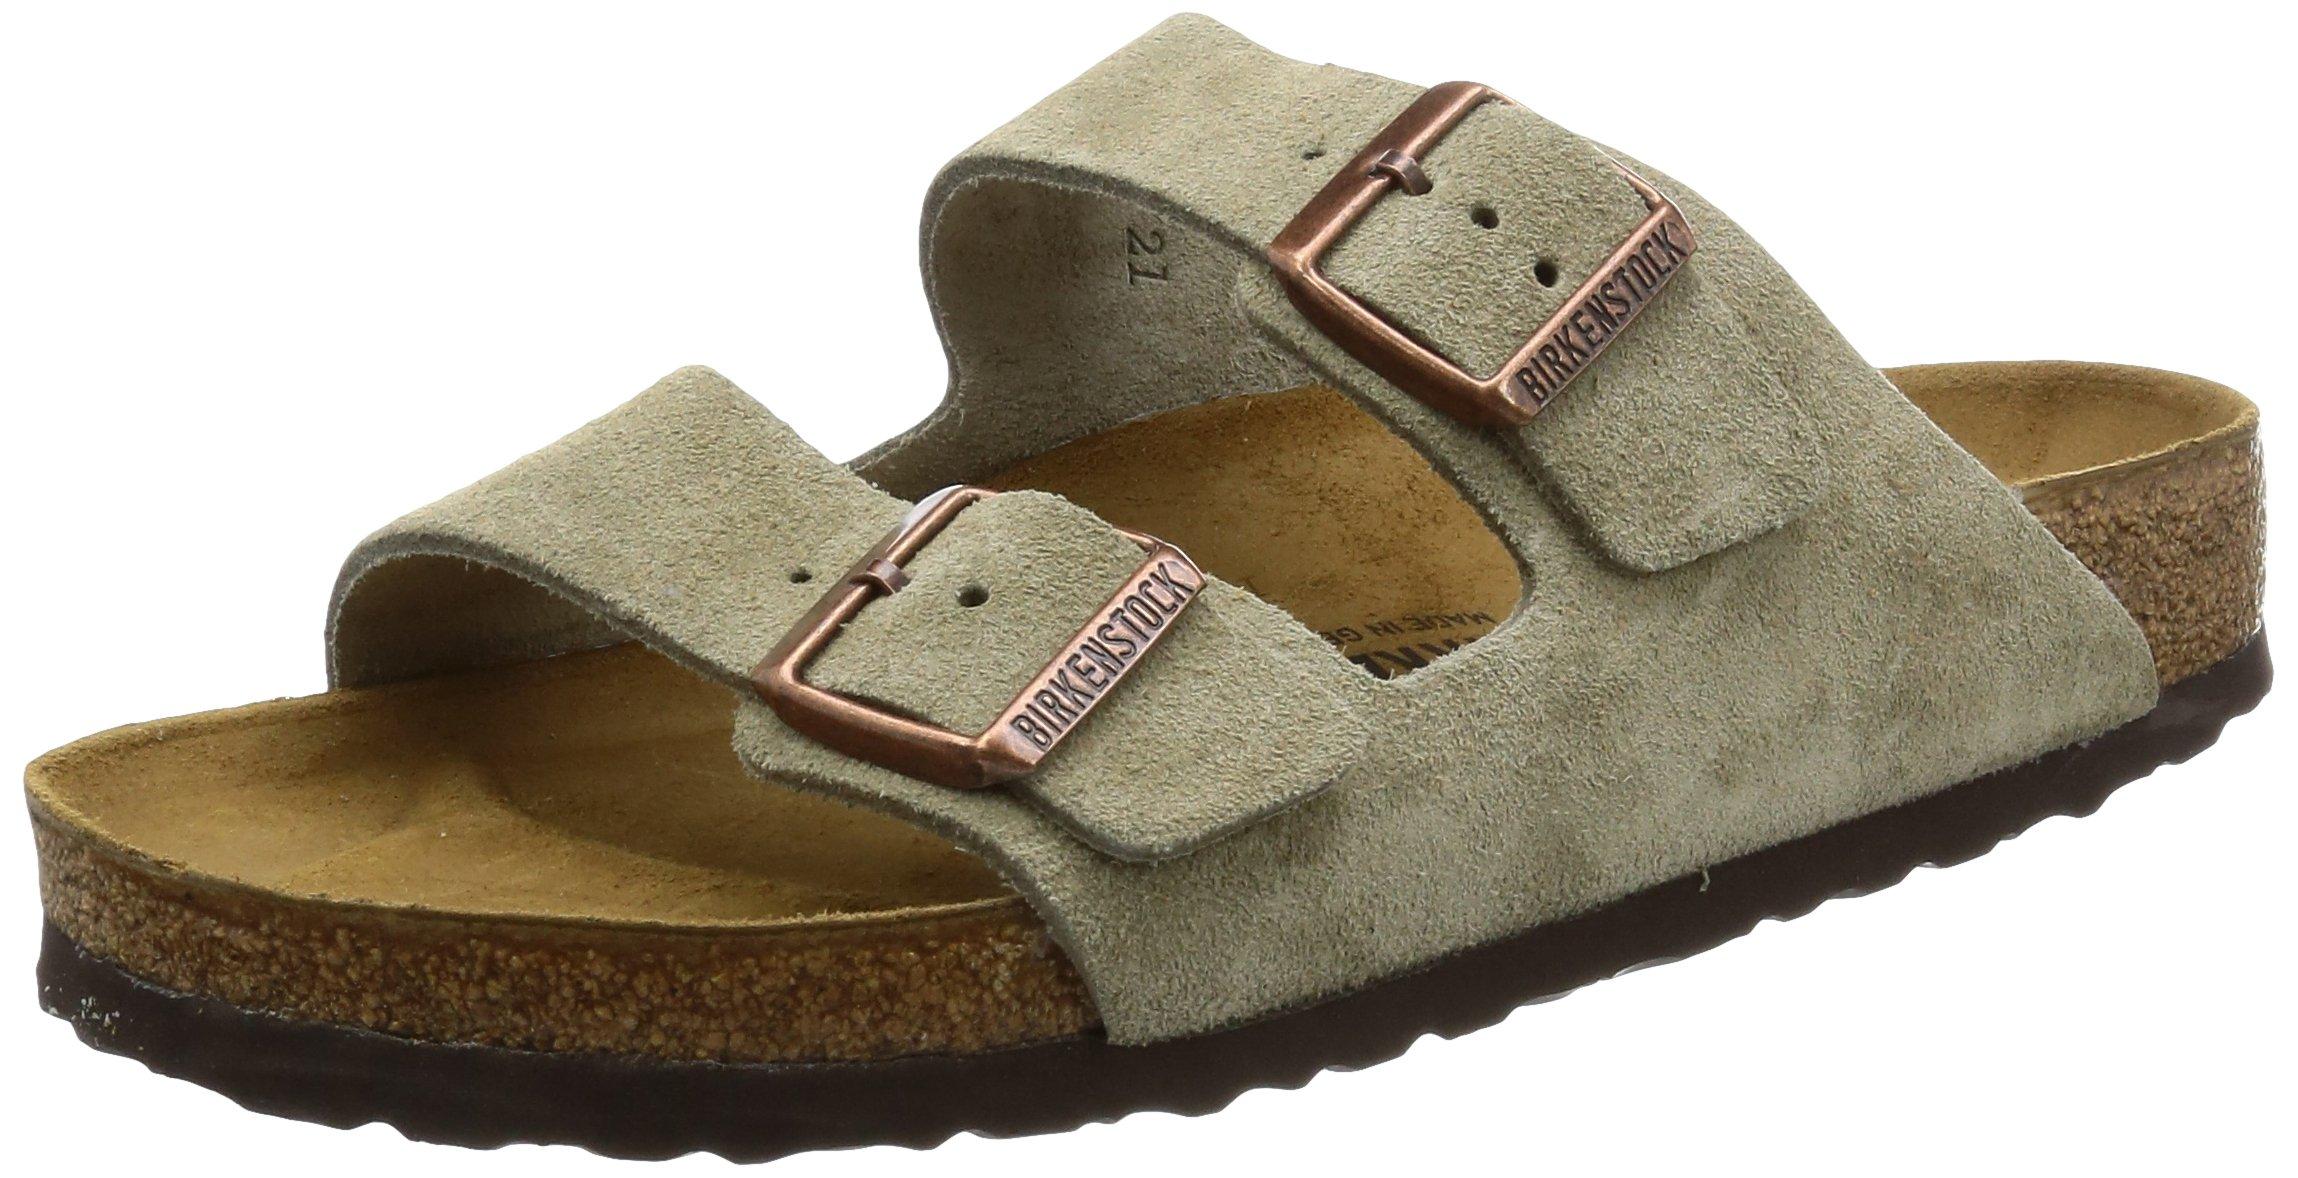 Birkenstock Women´s Arizona Taupe Suede Sandals 36 N EU N 051463